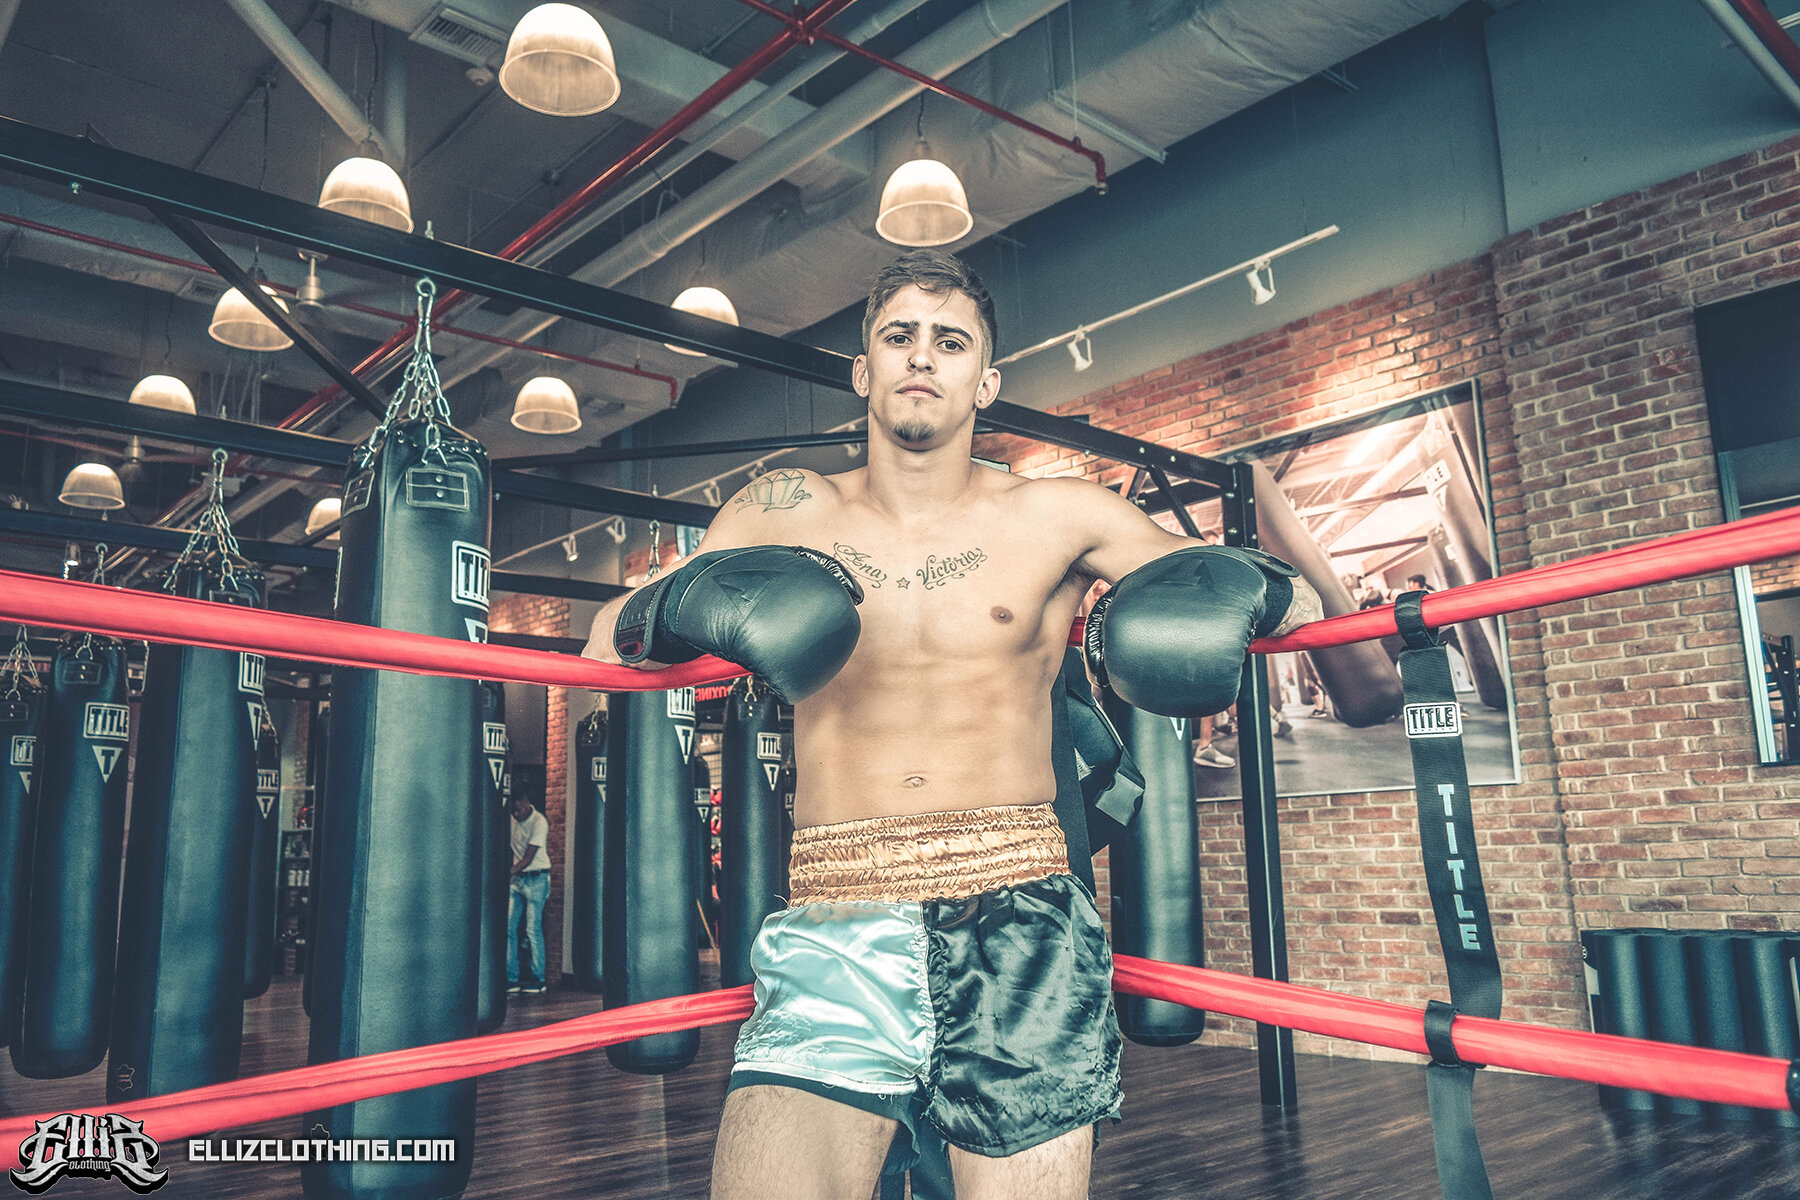 Braian Leiva Elliz Clothing MMA Photoshoot 05